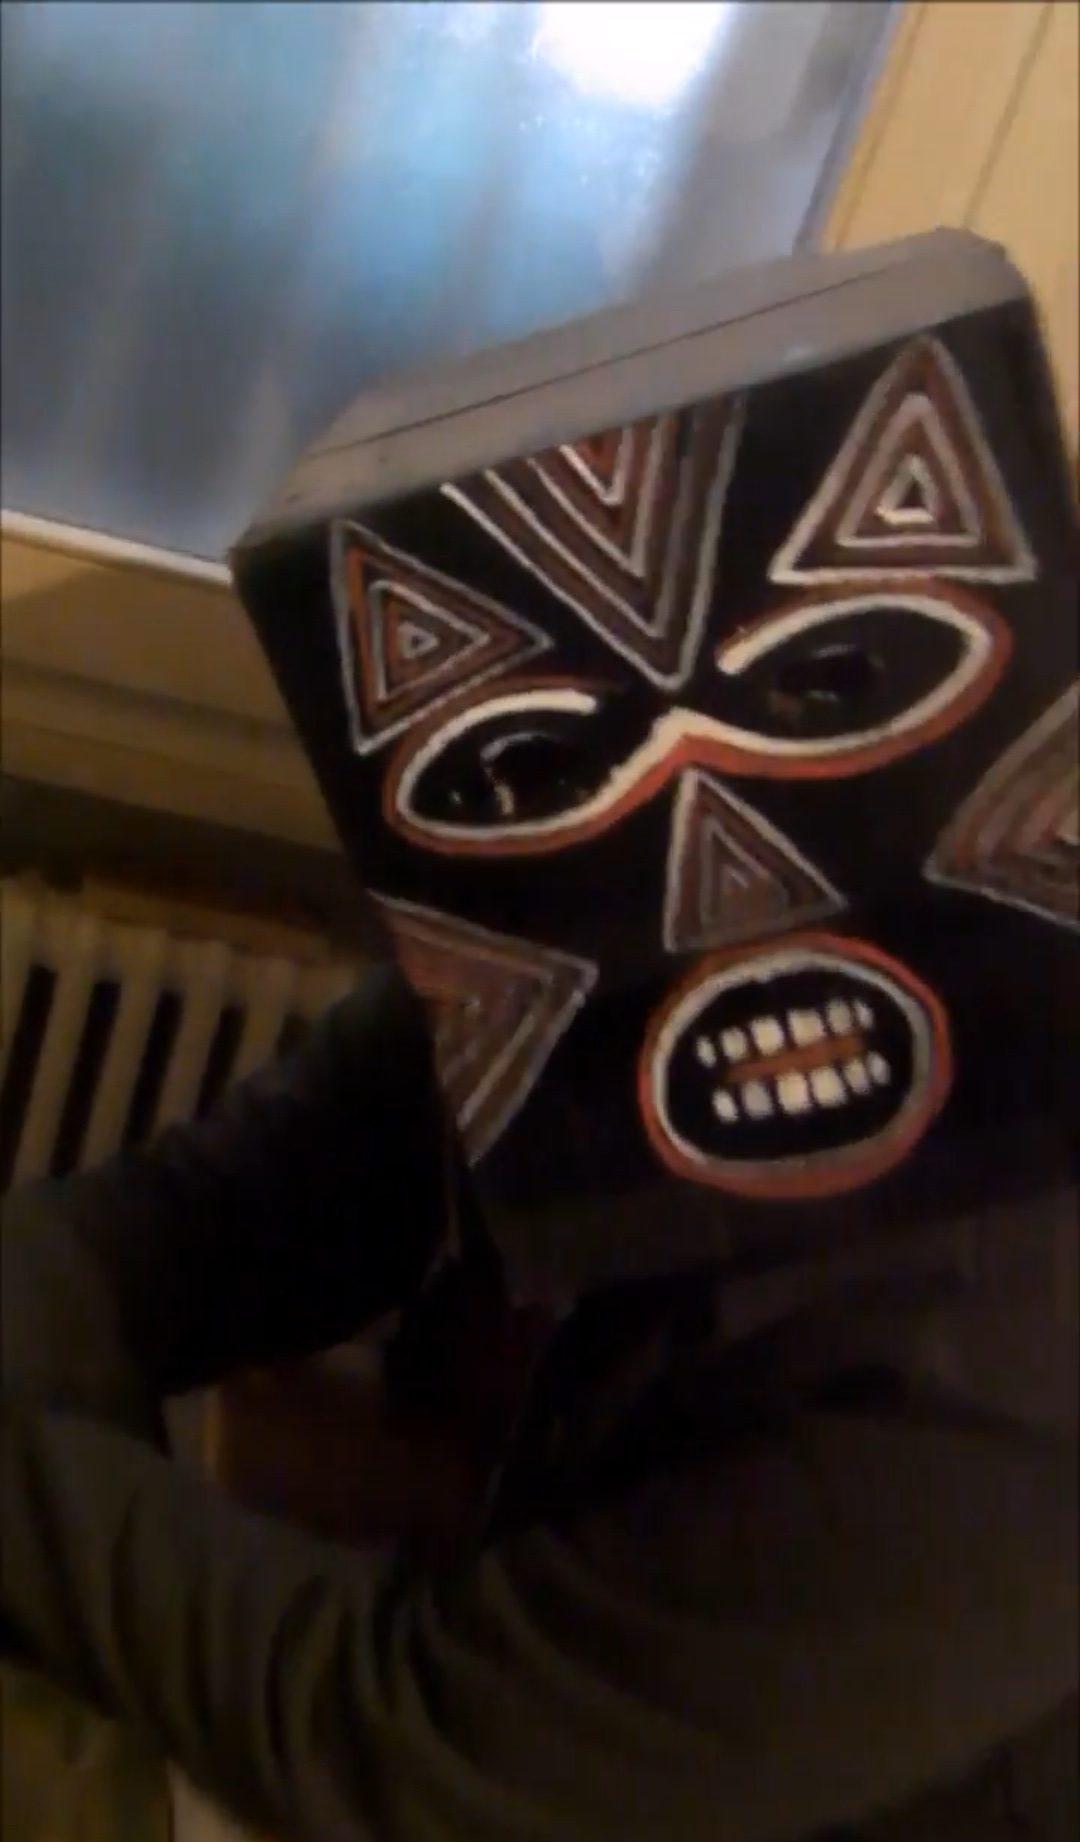 Le rime paranormali del noise-rap di Makumbo